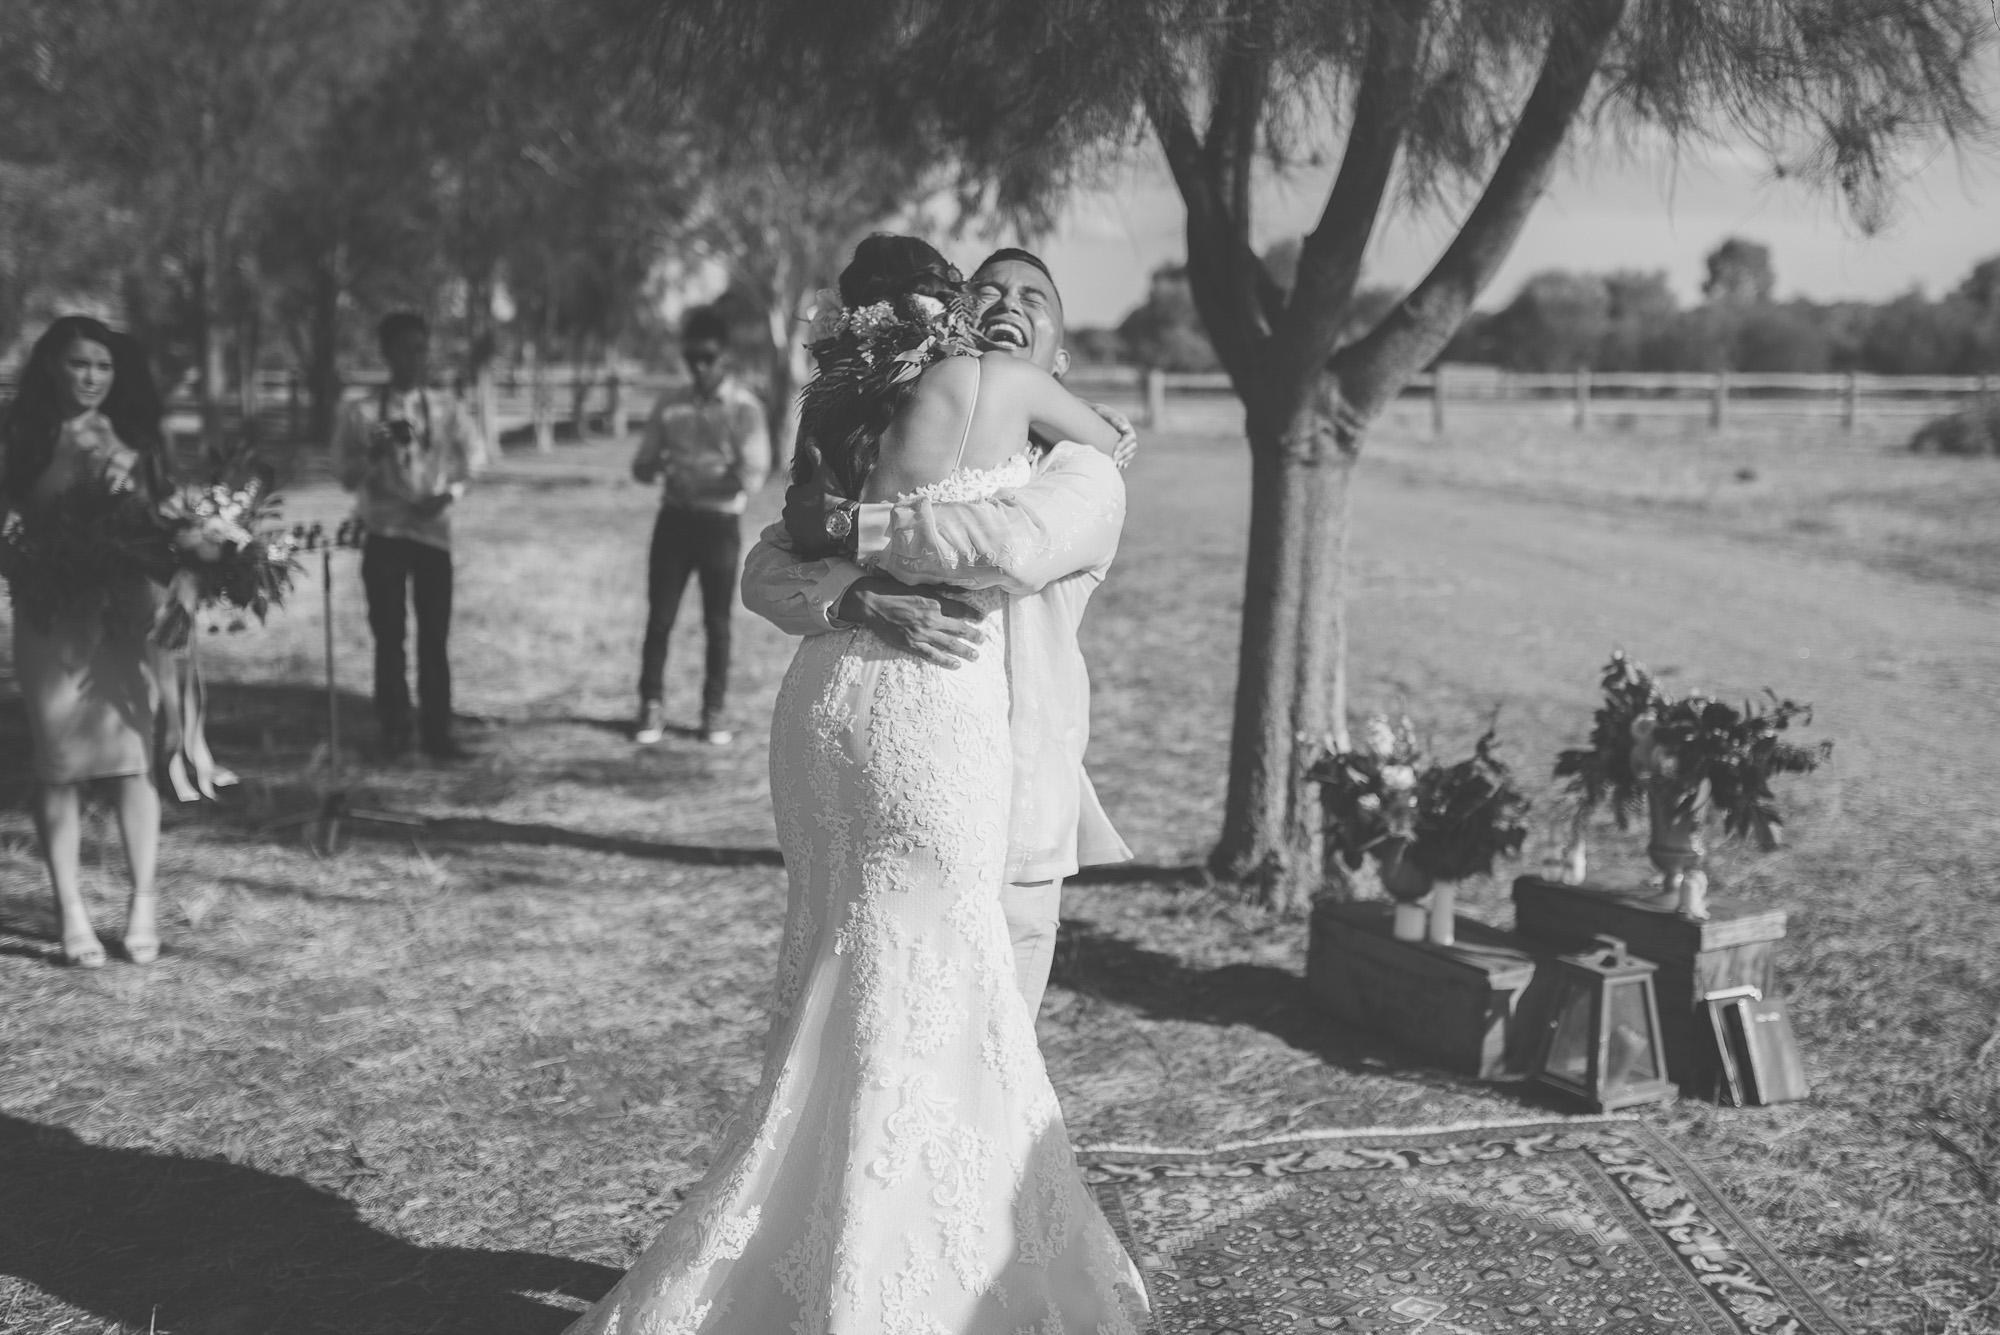 wedding-photographer-outdoor-casual-styled-los-angeles-australia-california-international-earthbound -35.jpg